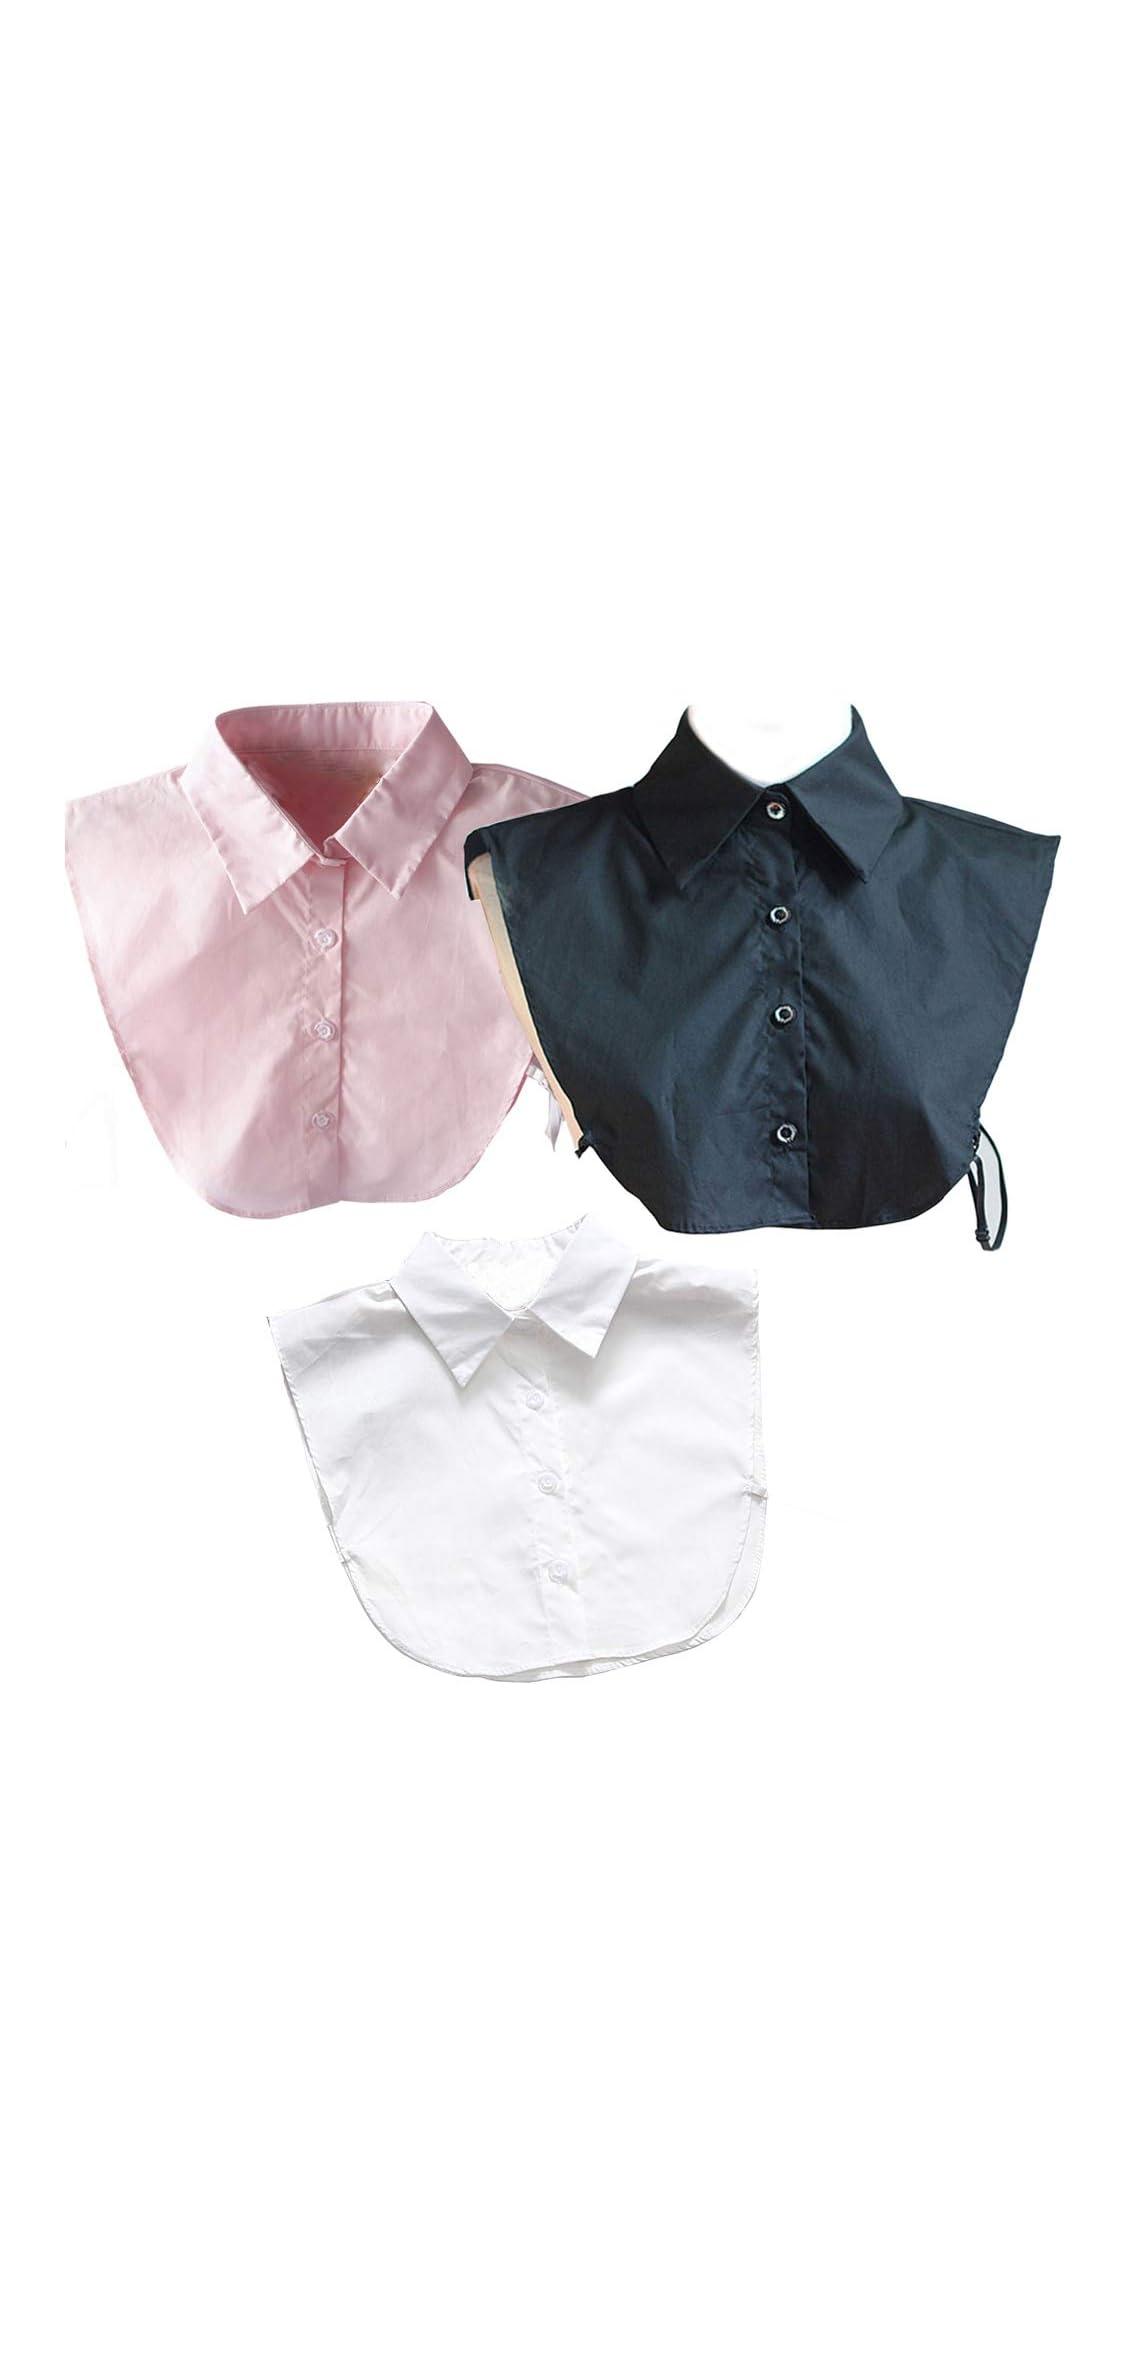 Shirt Collar, Detachable Blouse Fake False Faux Collars